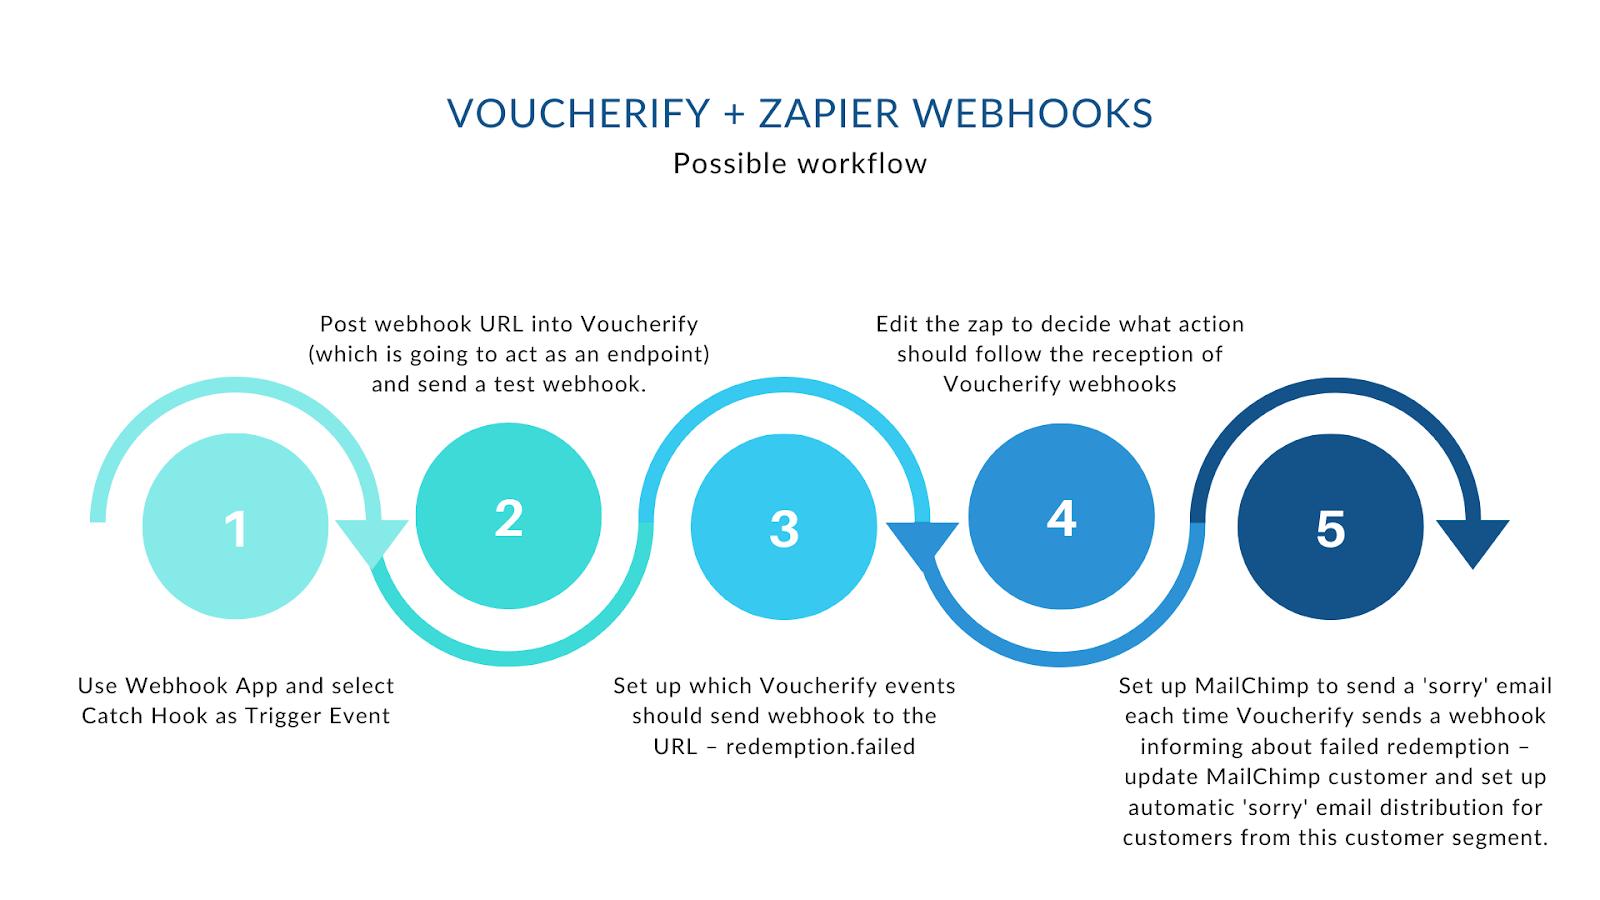 Voucherfiy ane webhooks workflow for MailChimp